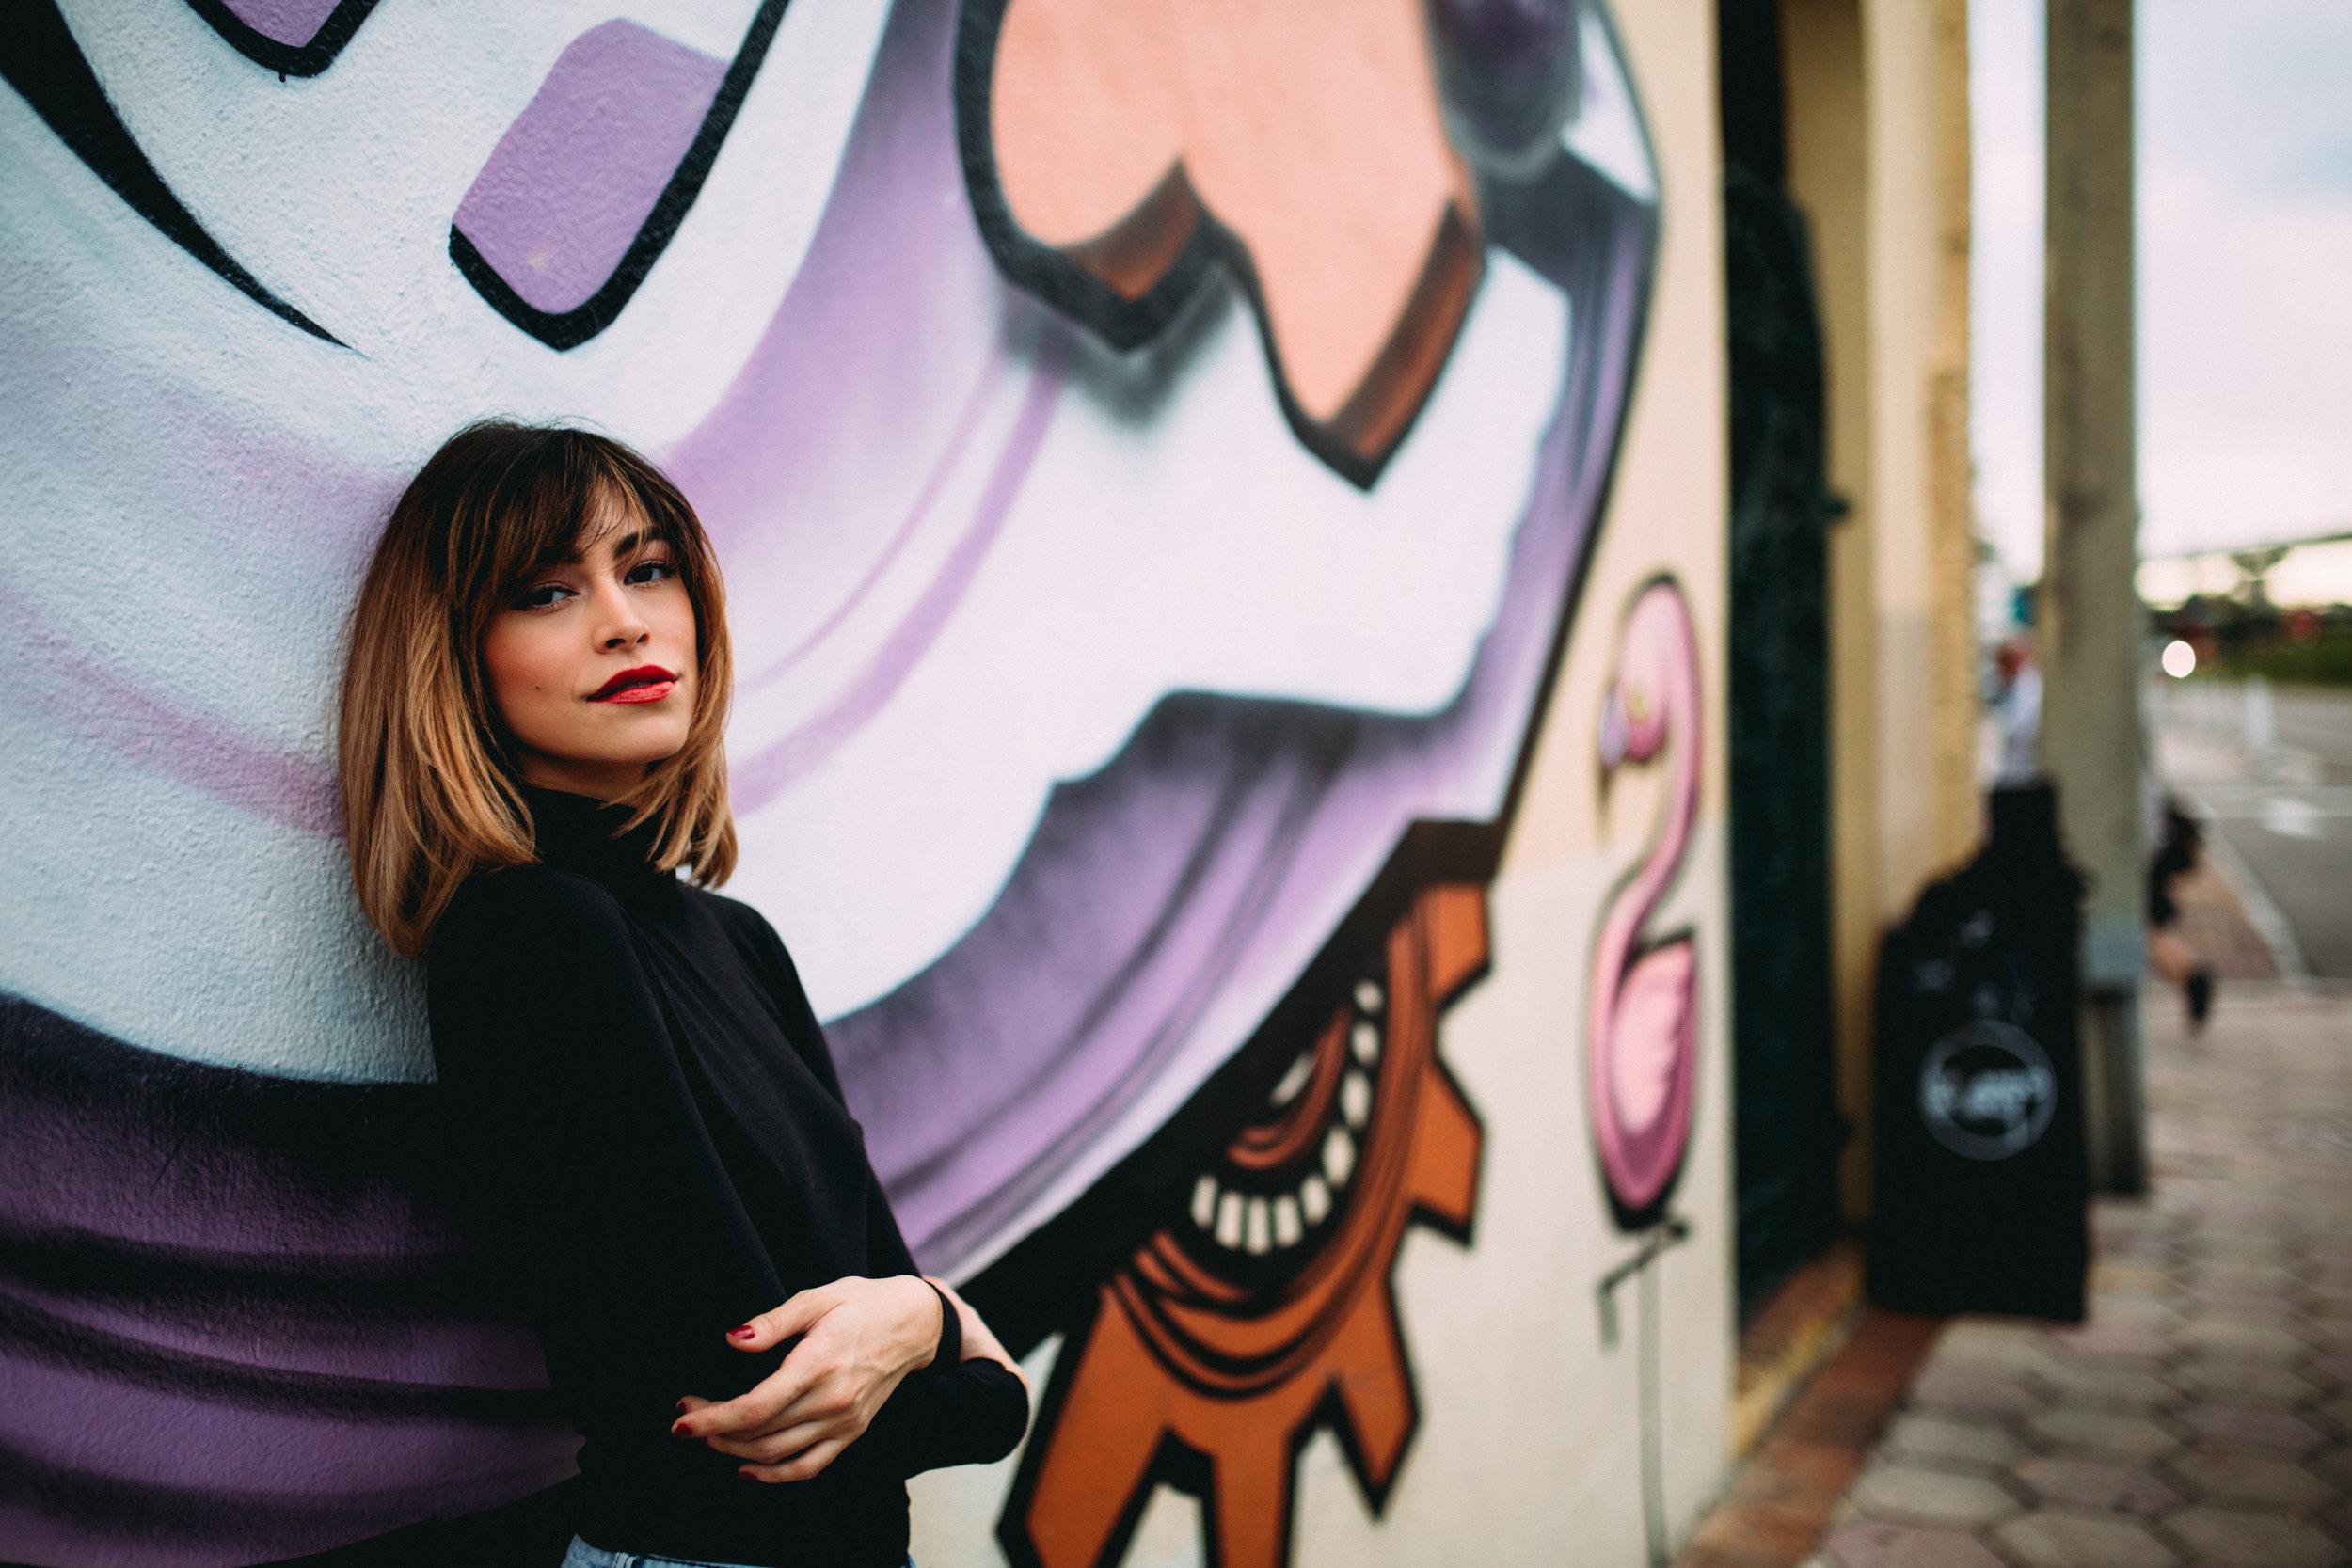 photographer-graffiti-portrait-yessy-rivera